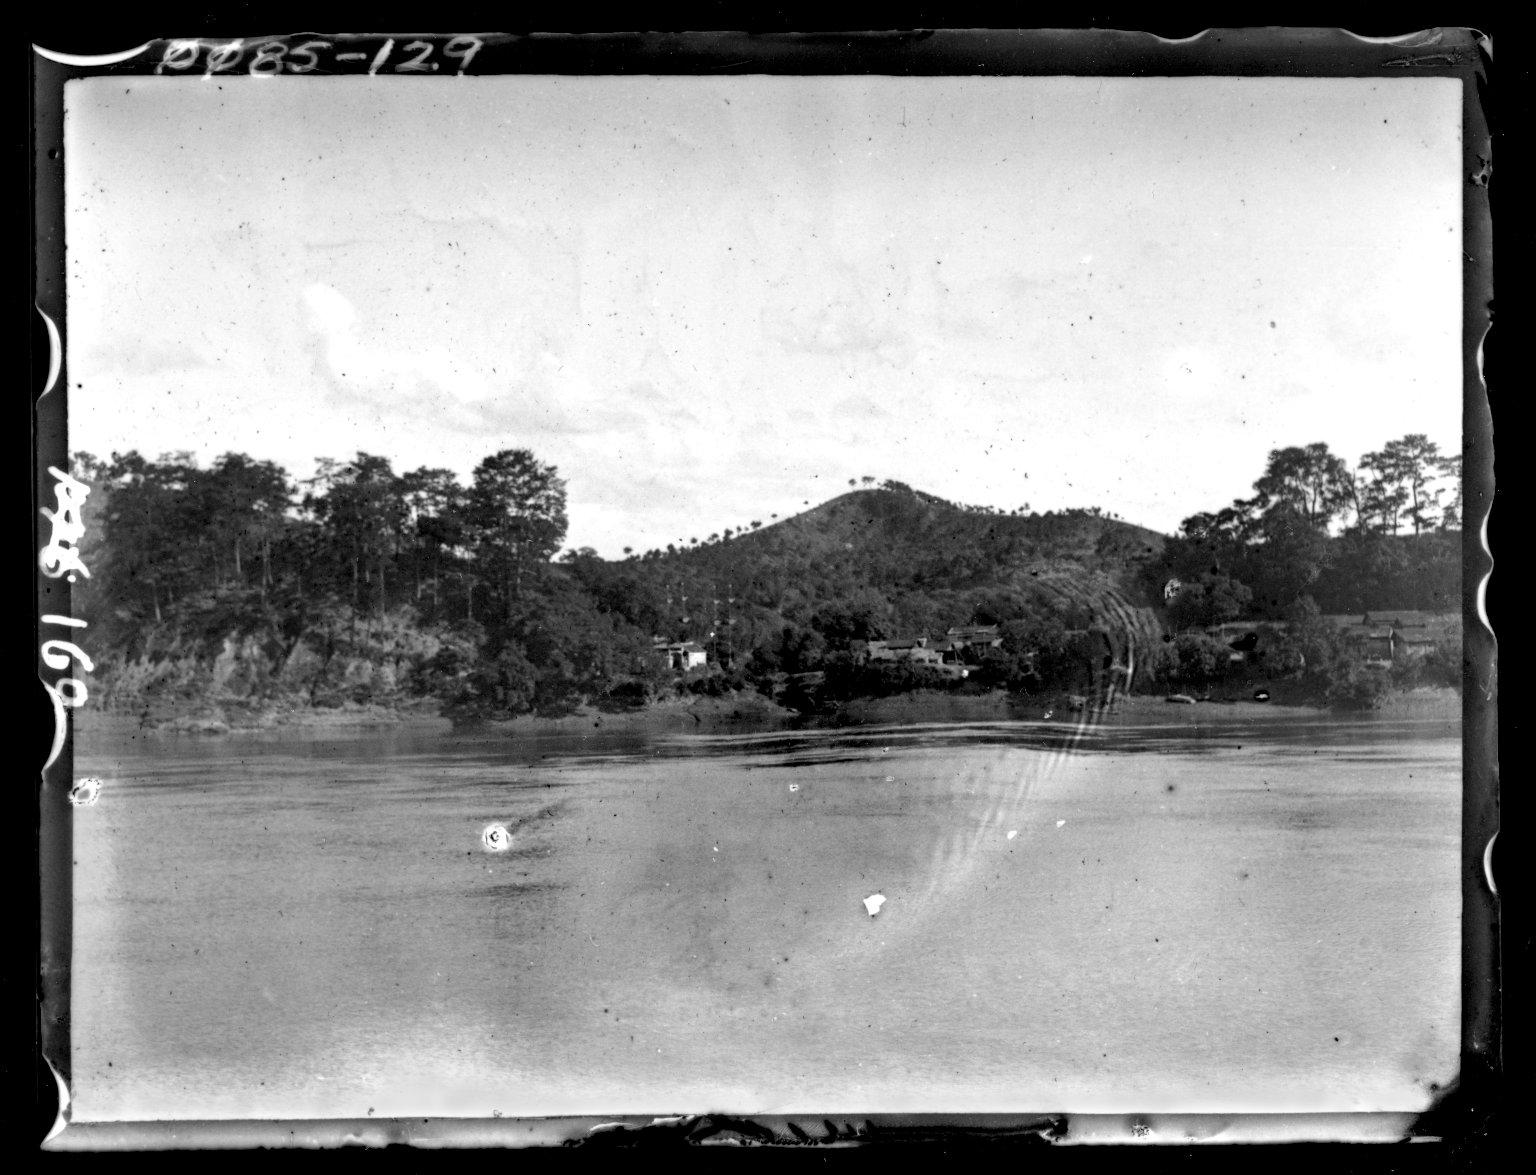 West River-1